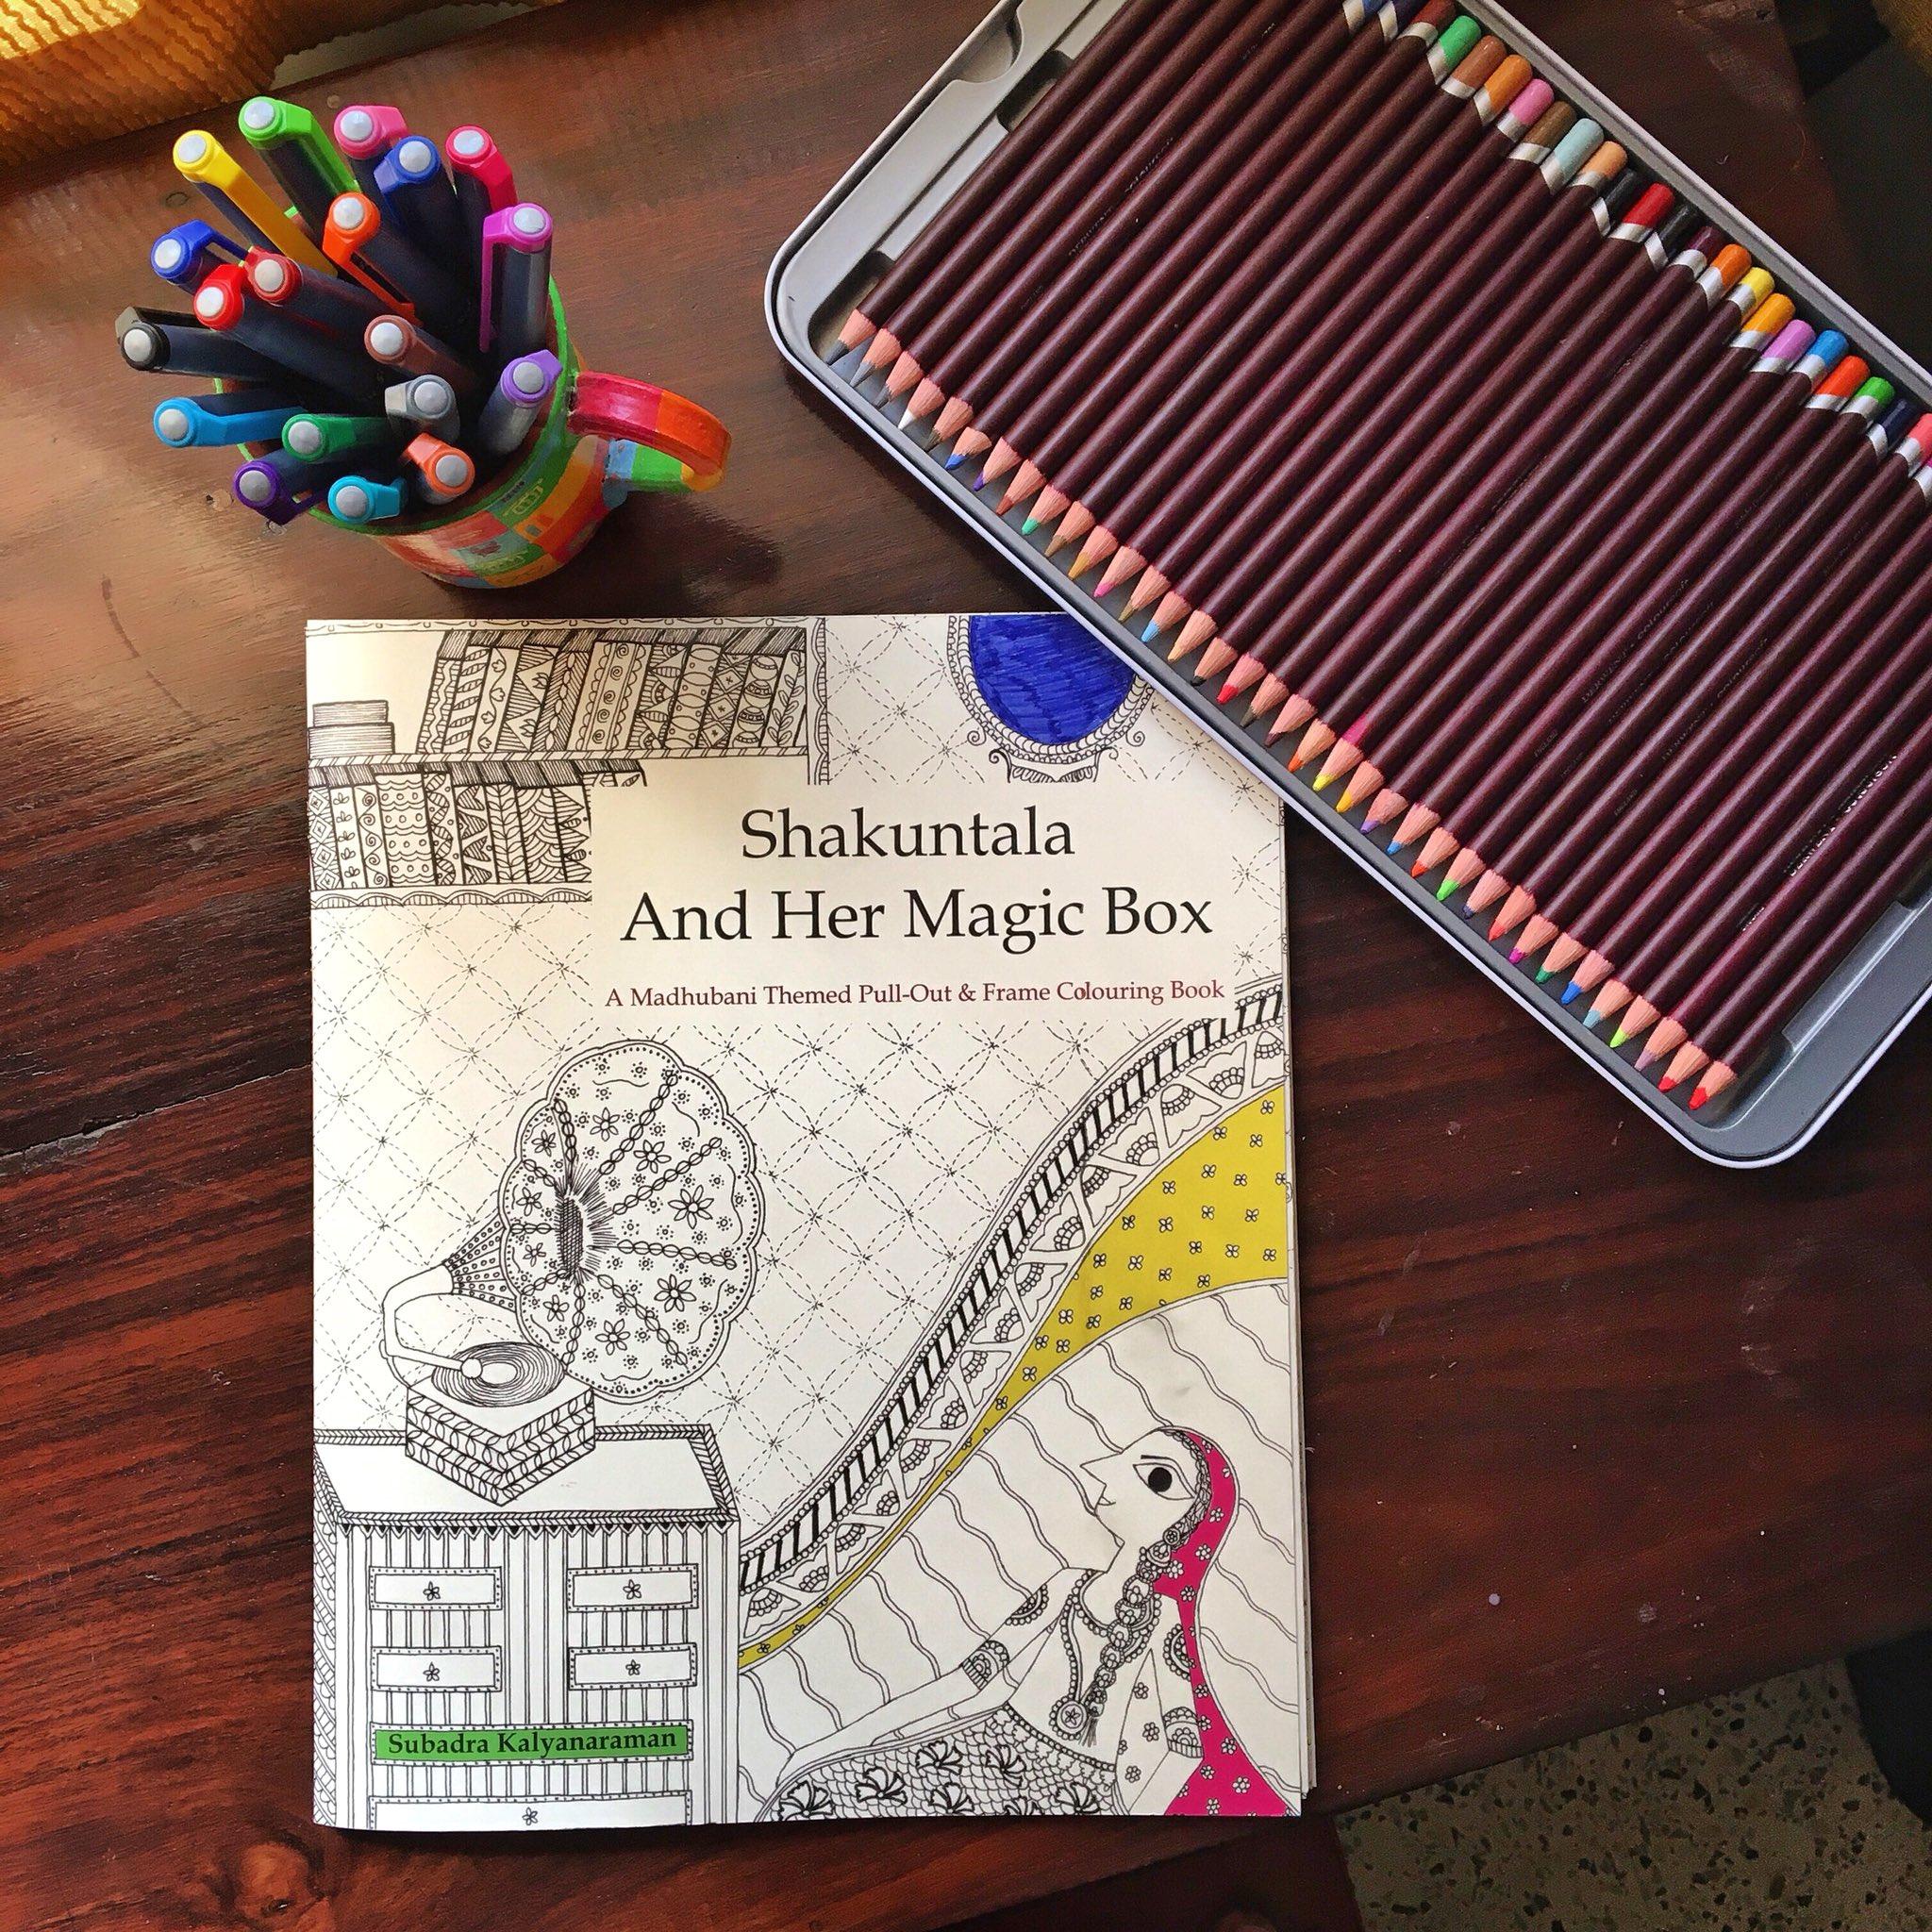 Subadra On Twitter ShakuntalaAndHerMagicBox A Madhubani Themed Adult Colouring Book Now Amazon Order Off Tco 0f09h6ntVb